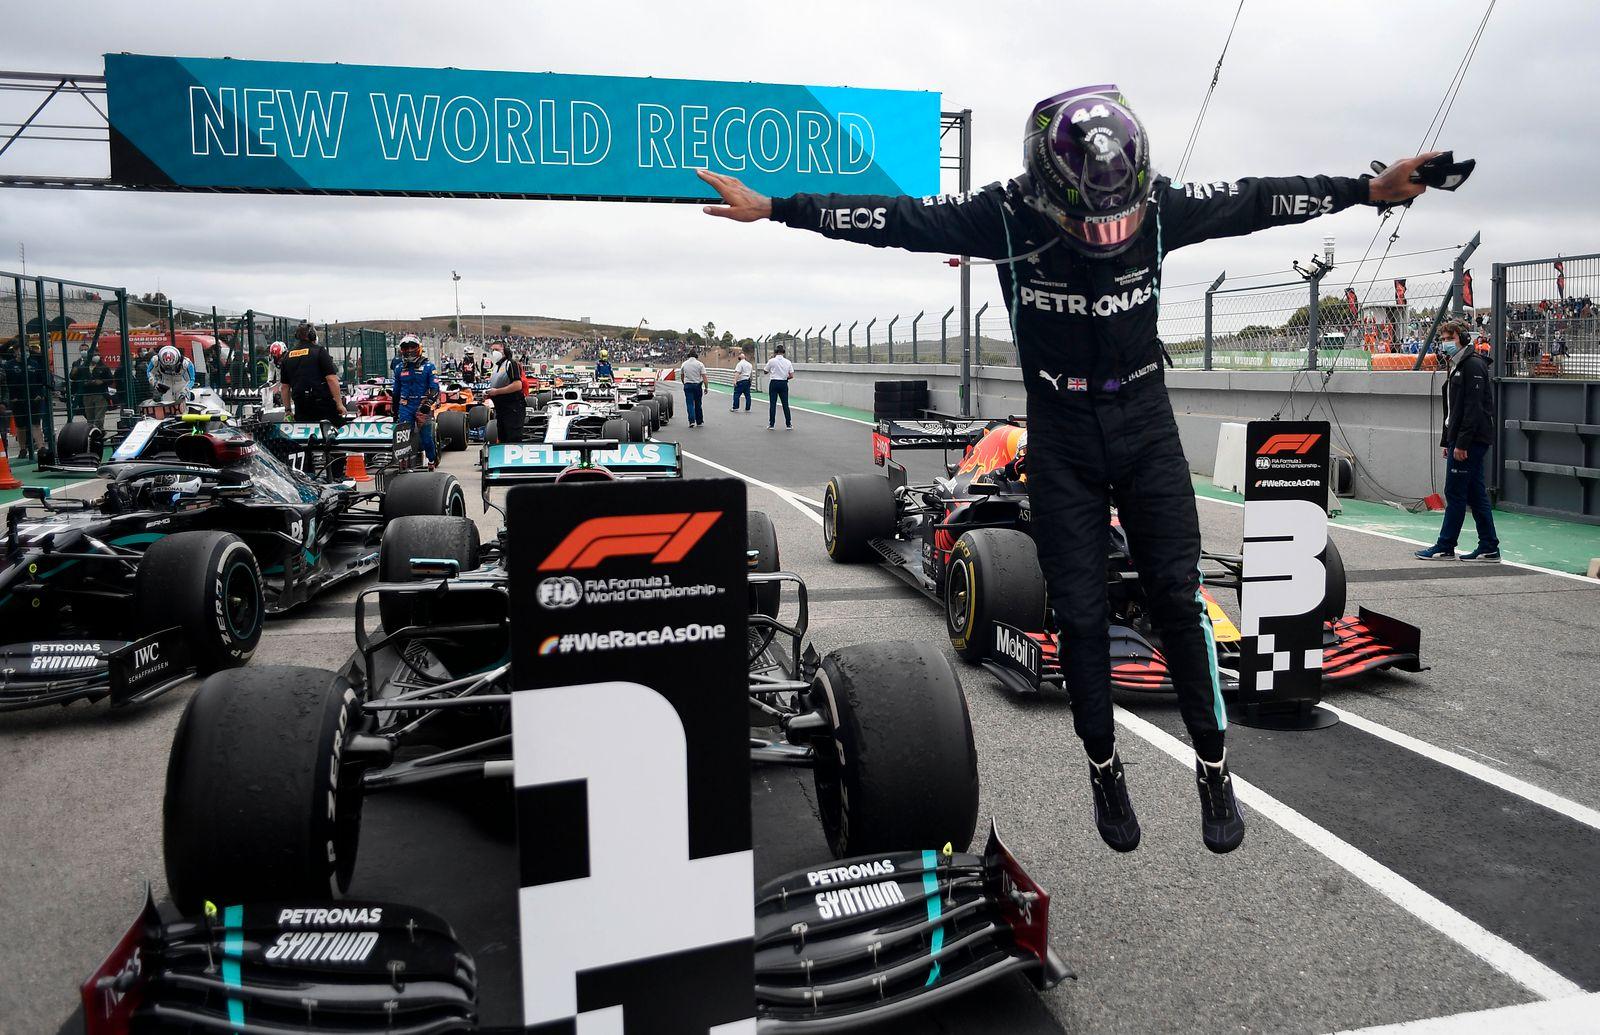 APTOPIX Portugal F1 GP Auto Racing